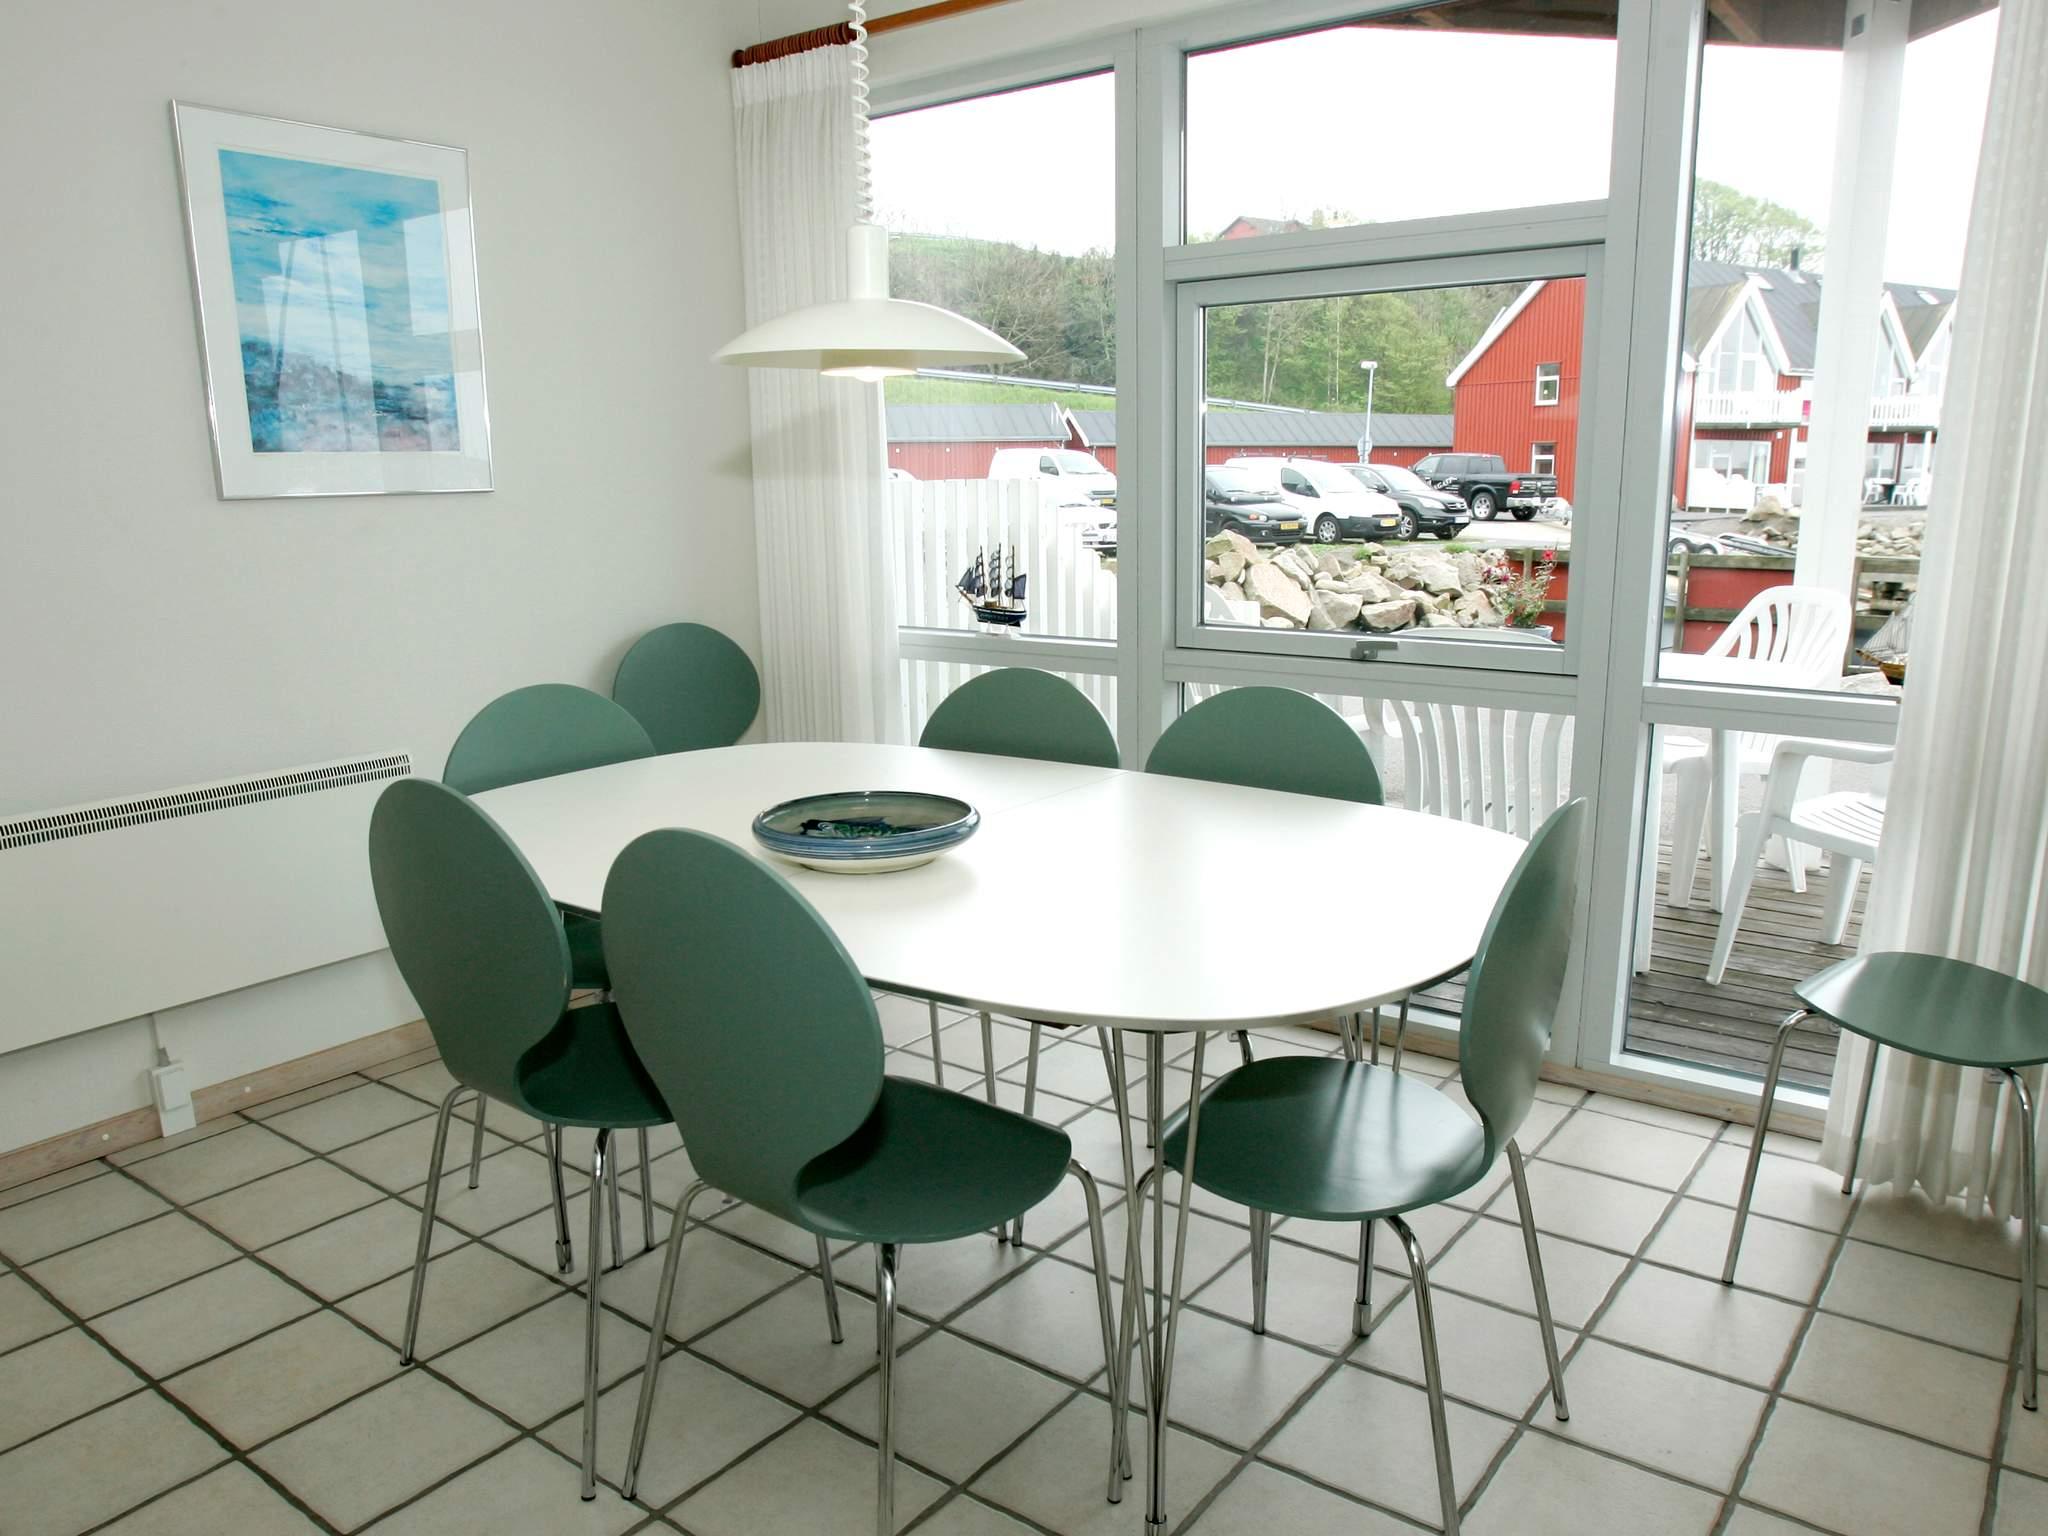 Ferienhaus Hasle (84885), Hasle, , Bornholm, Dänemark, Bild 6